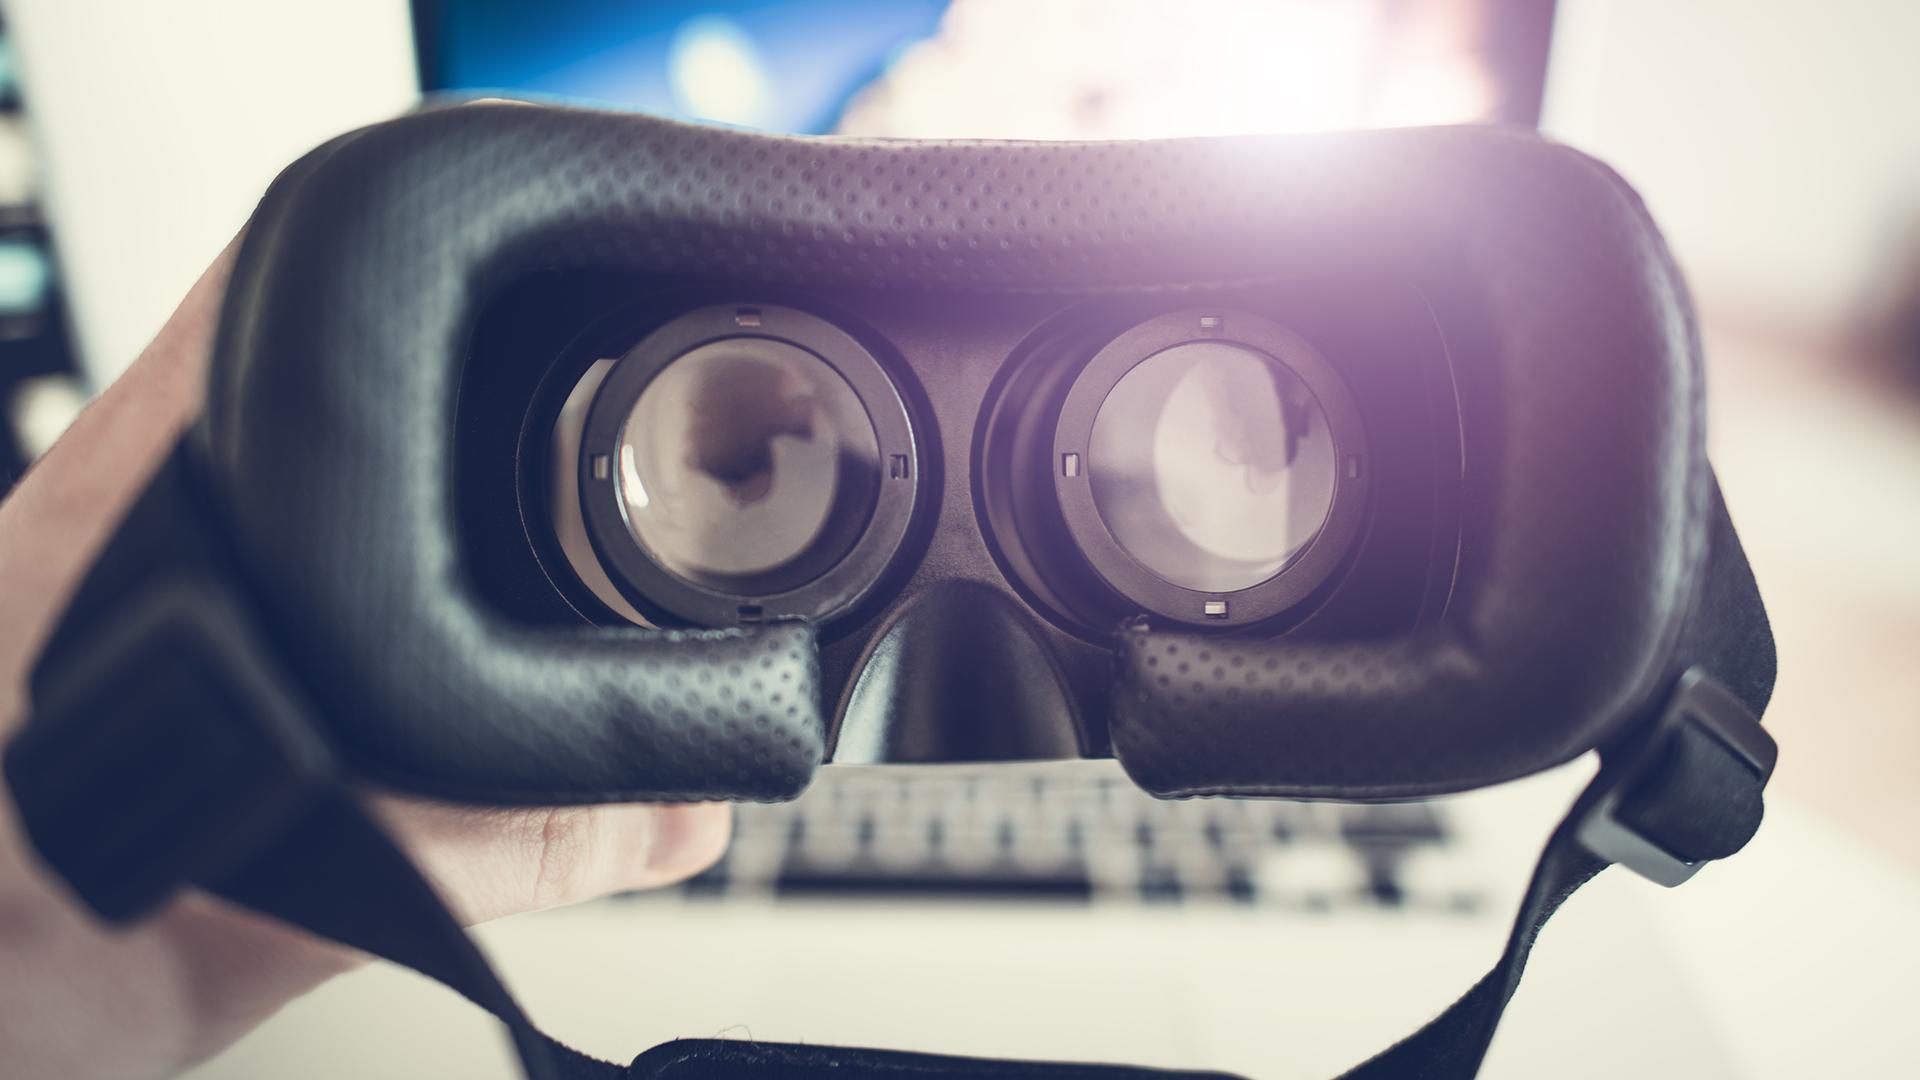 Sección-servicio-realidadvirtual-vr-gafas-360-grados-grupoaudiovisual